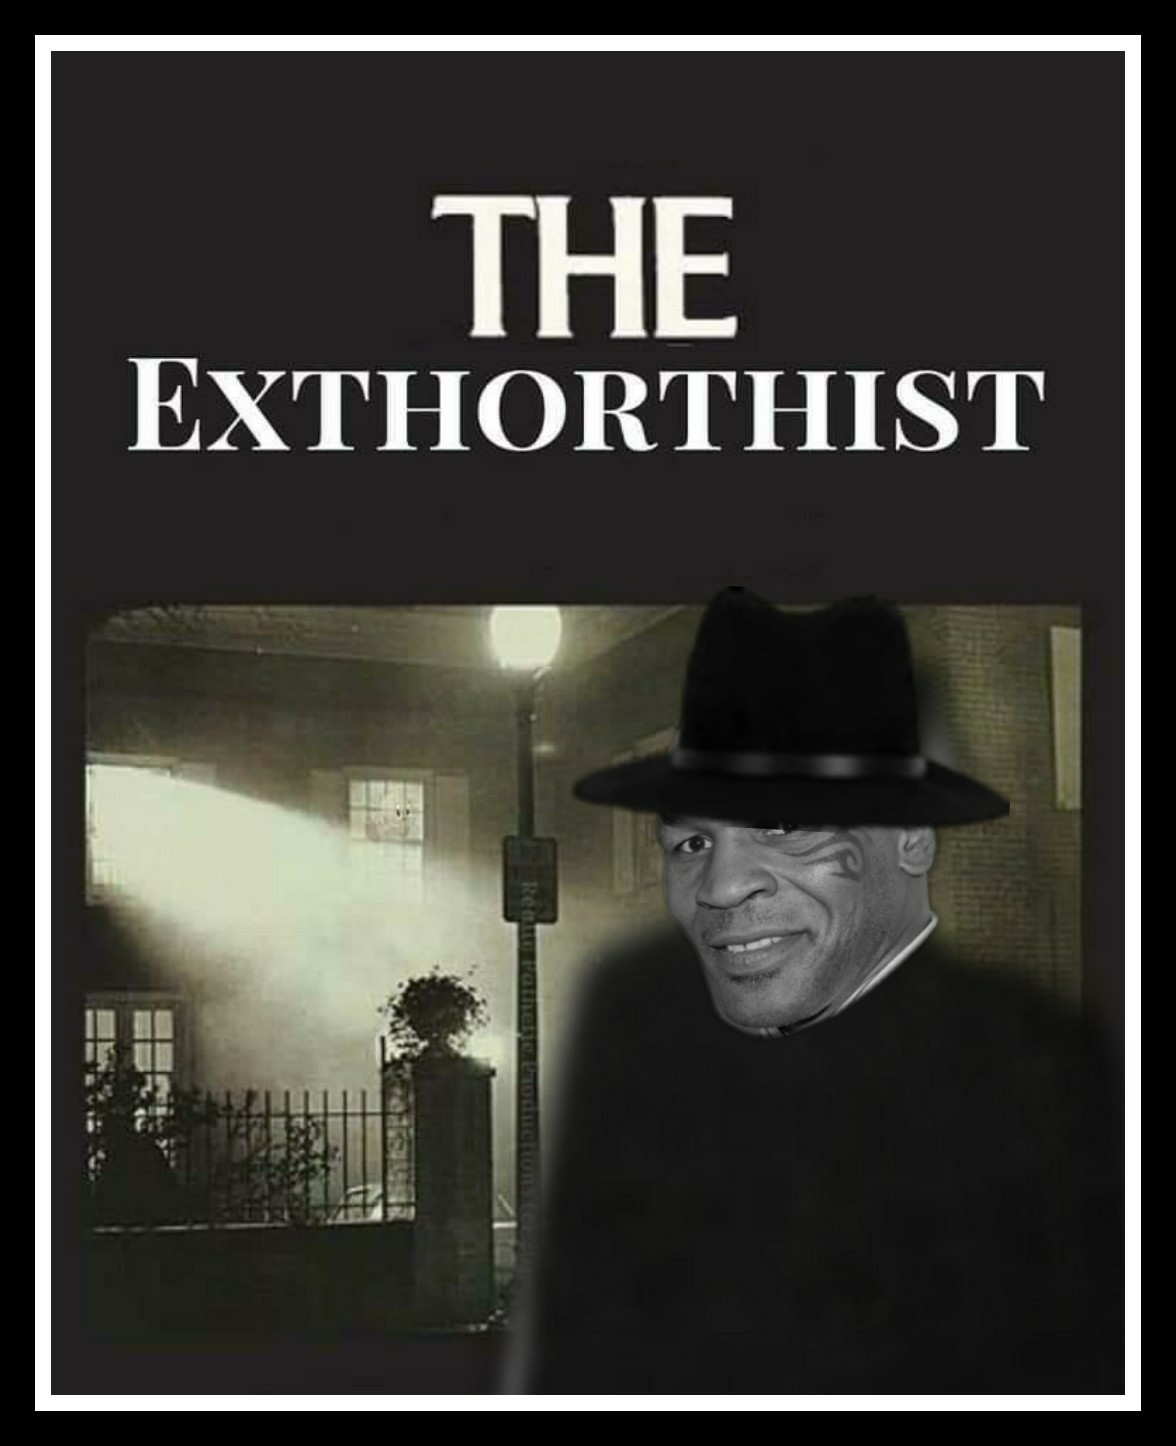 Exthorthist - meme